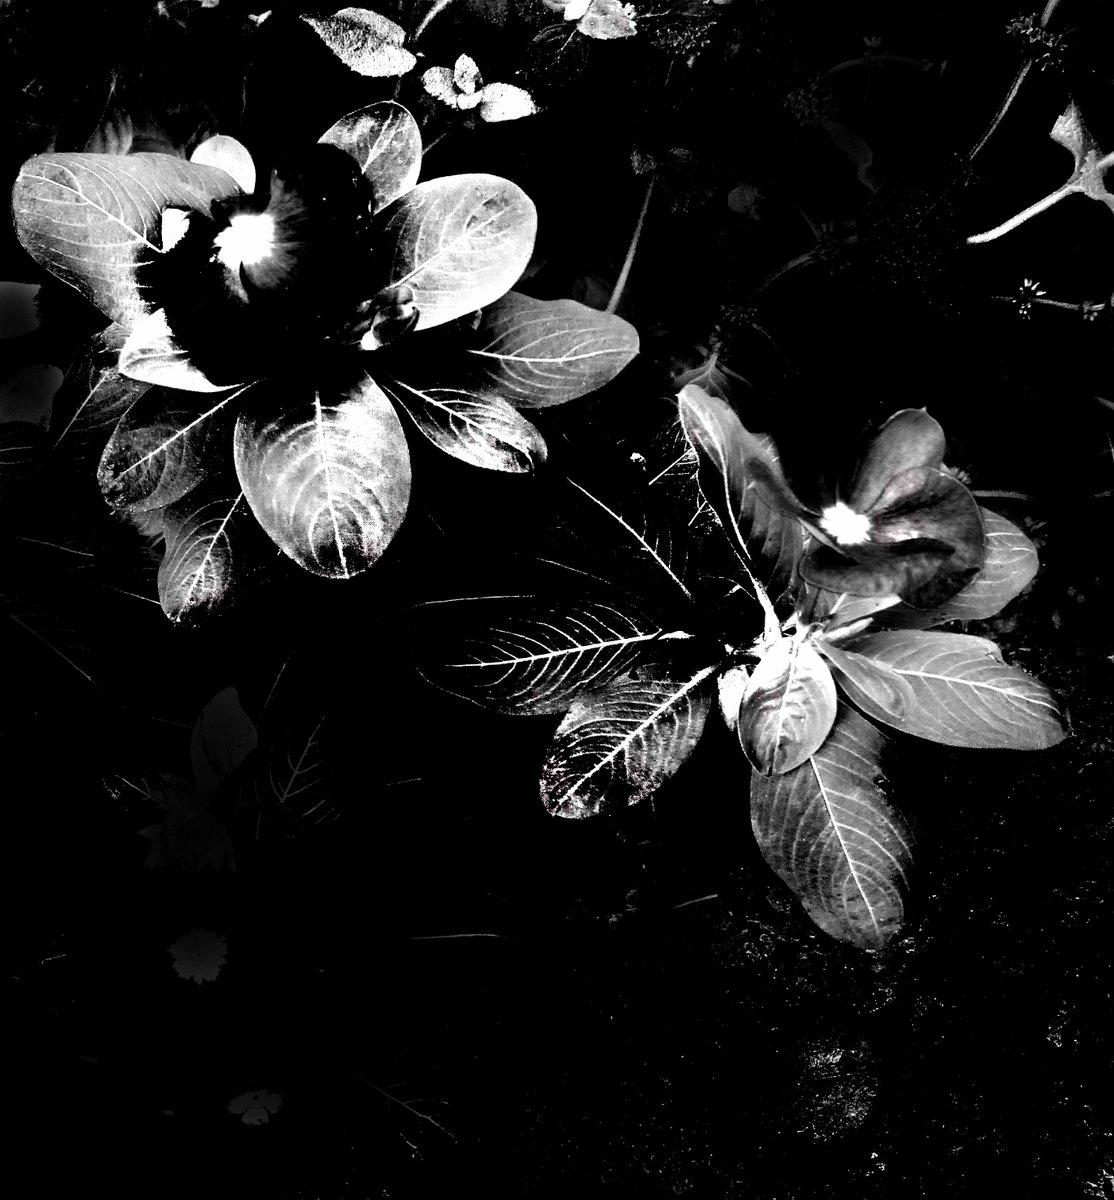 """ Black and White / 06 ""  #blackandwhitephotography #monochrome  #photography #fotografia #blancoynegro   photo by Taizo Hayashi ; Japan"